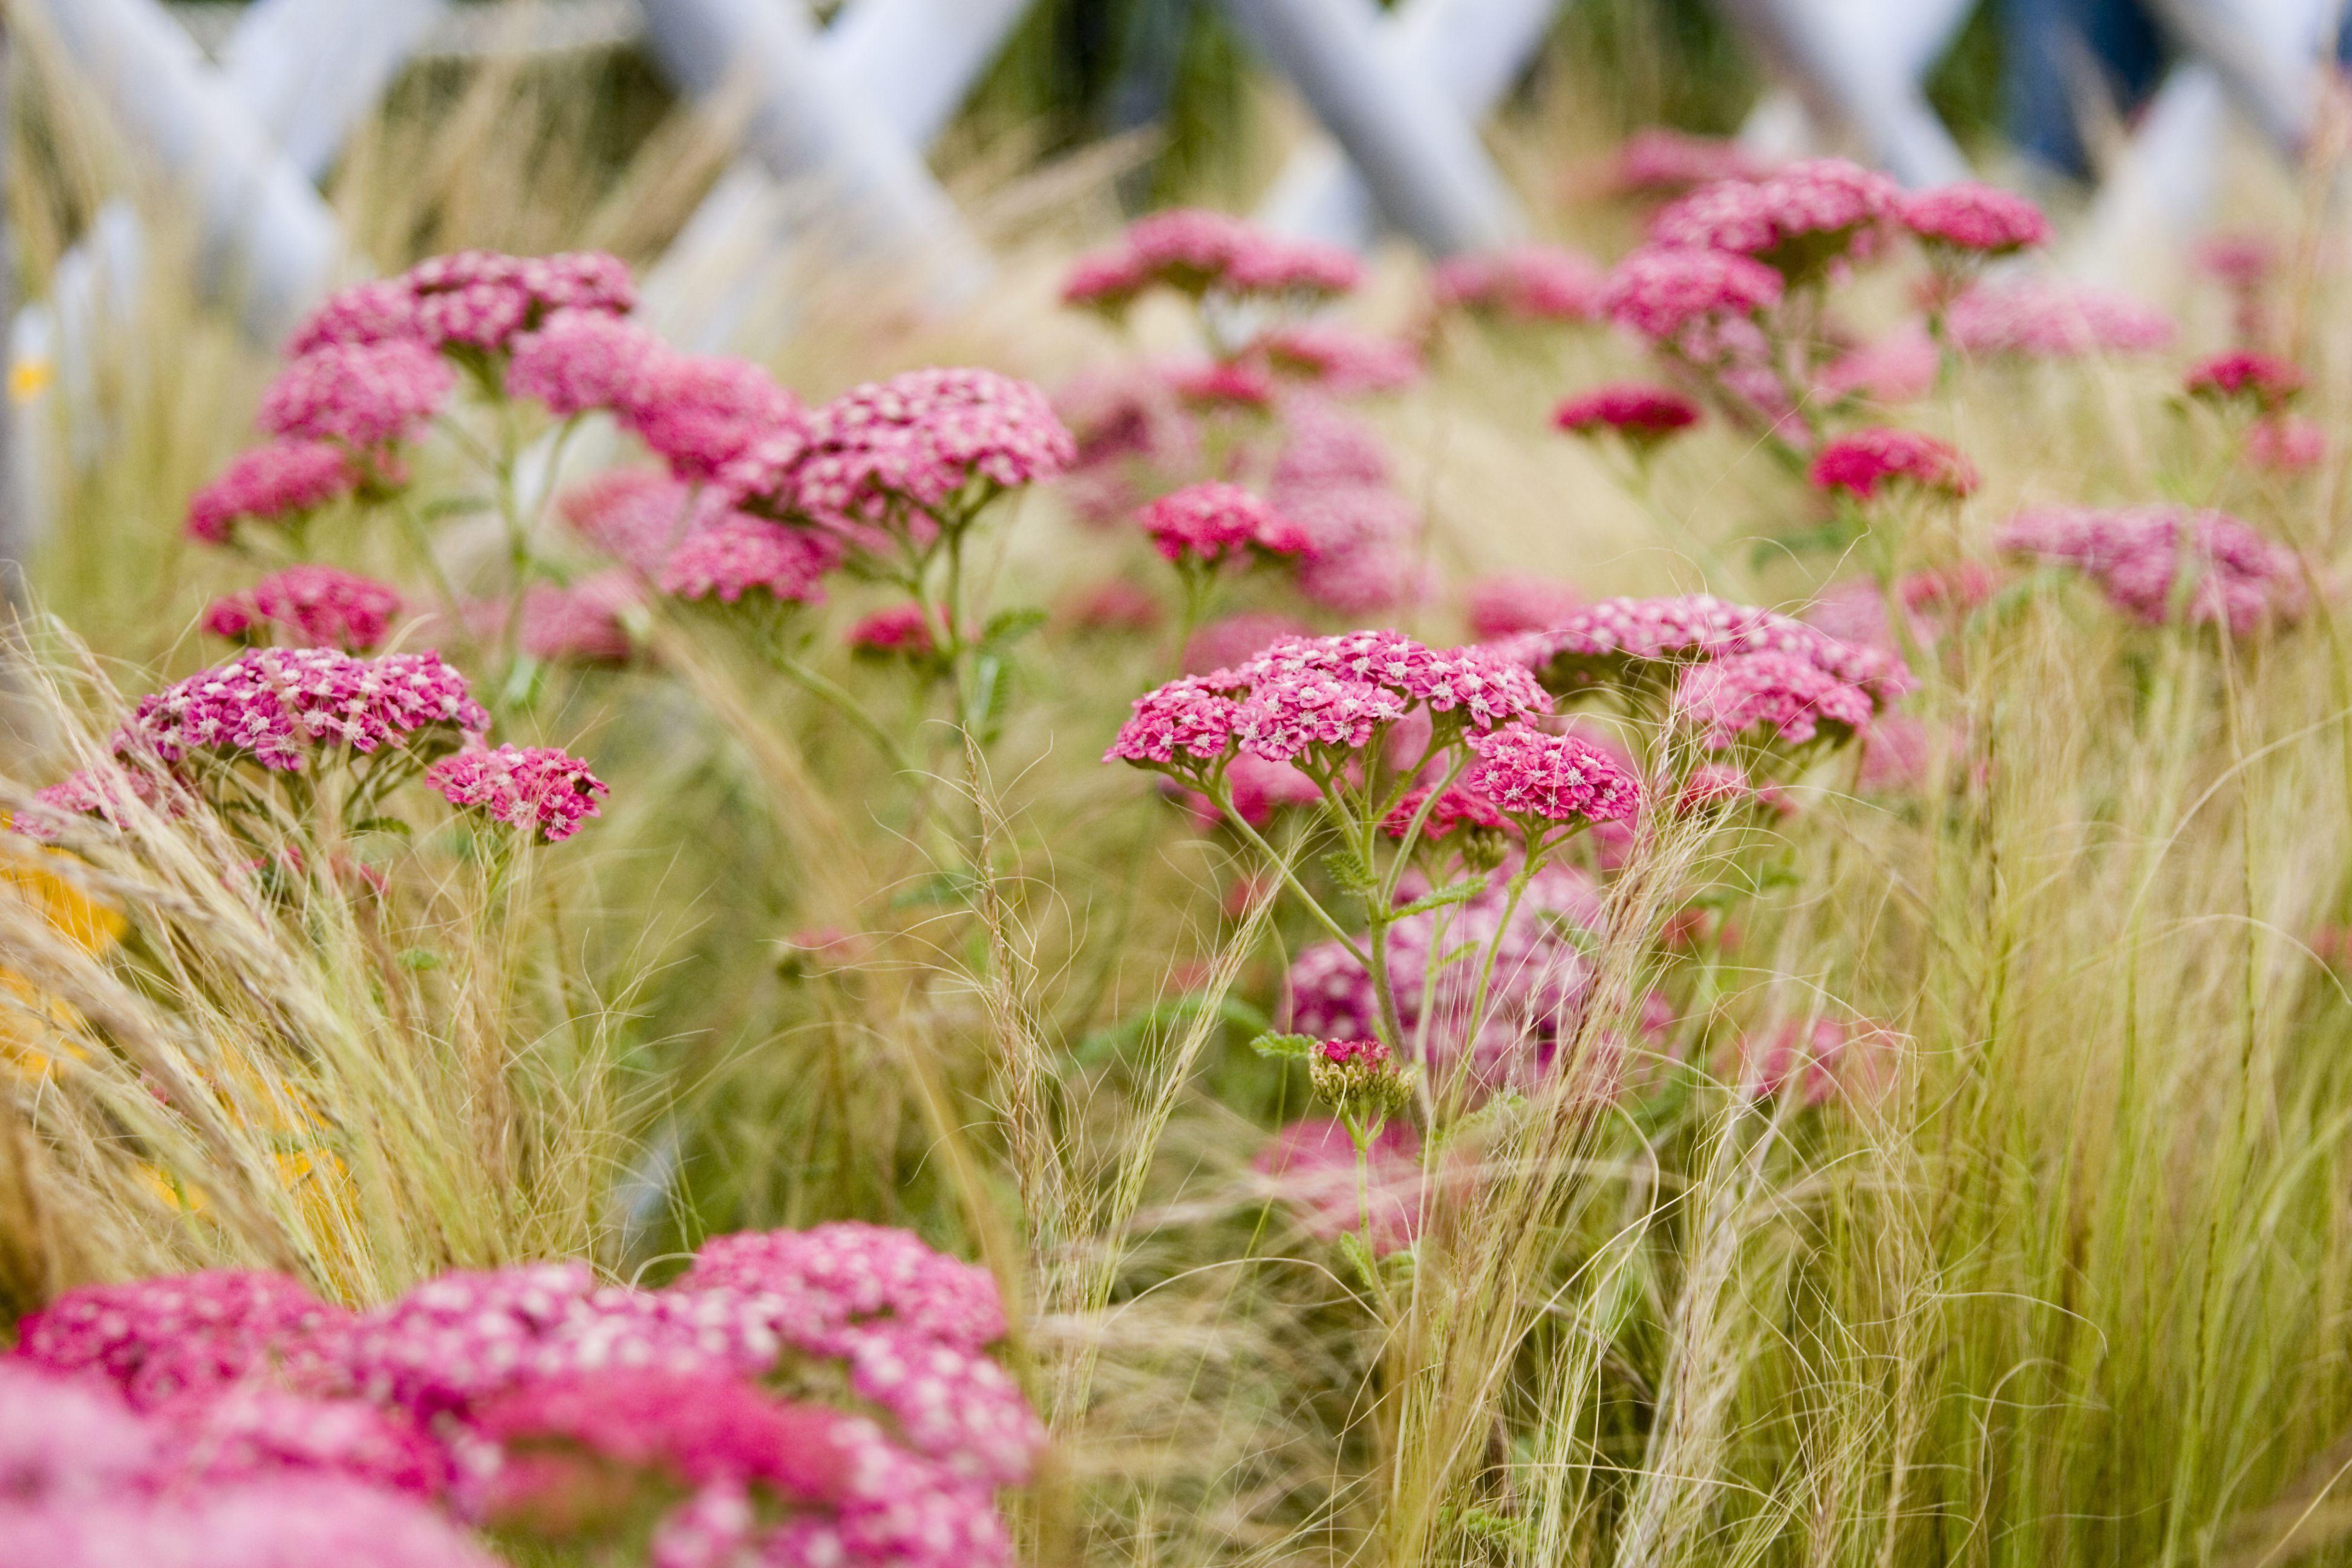 Hampton Court Flower Show, 2008 -- Yarrow (Achillea millefolium)